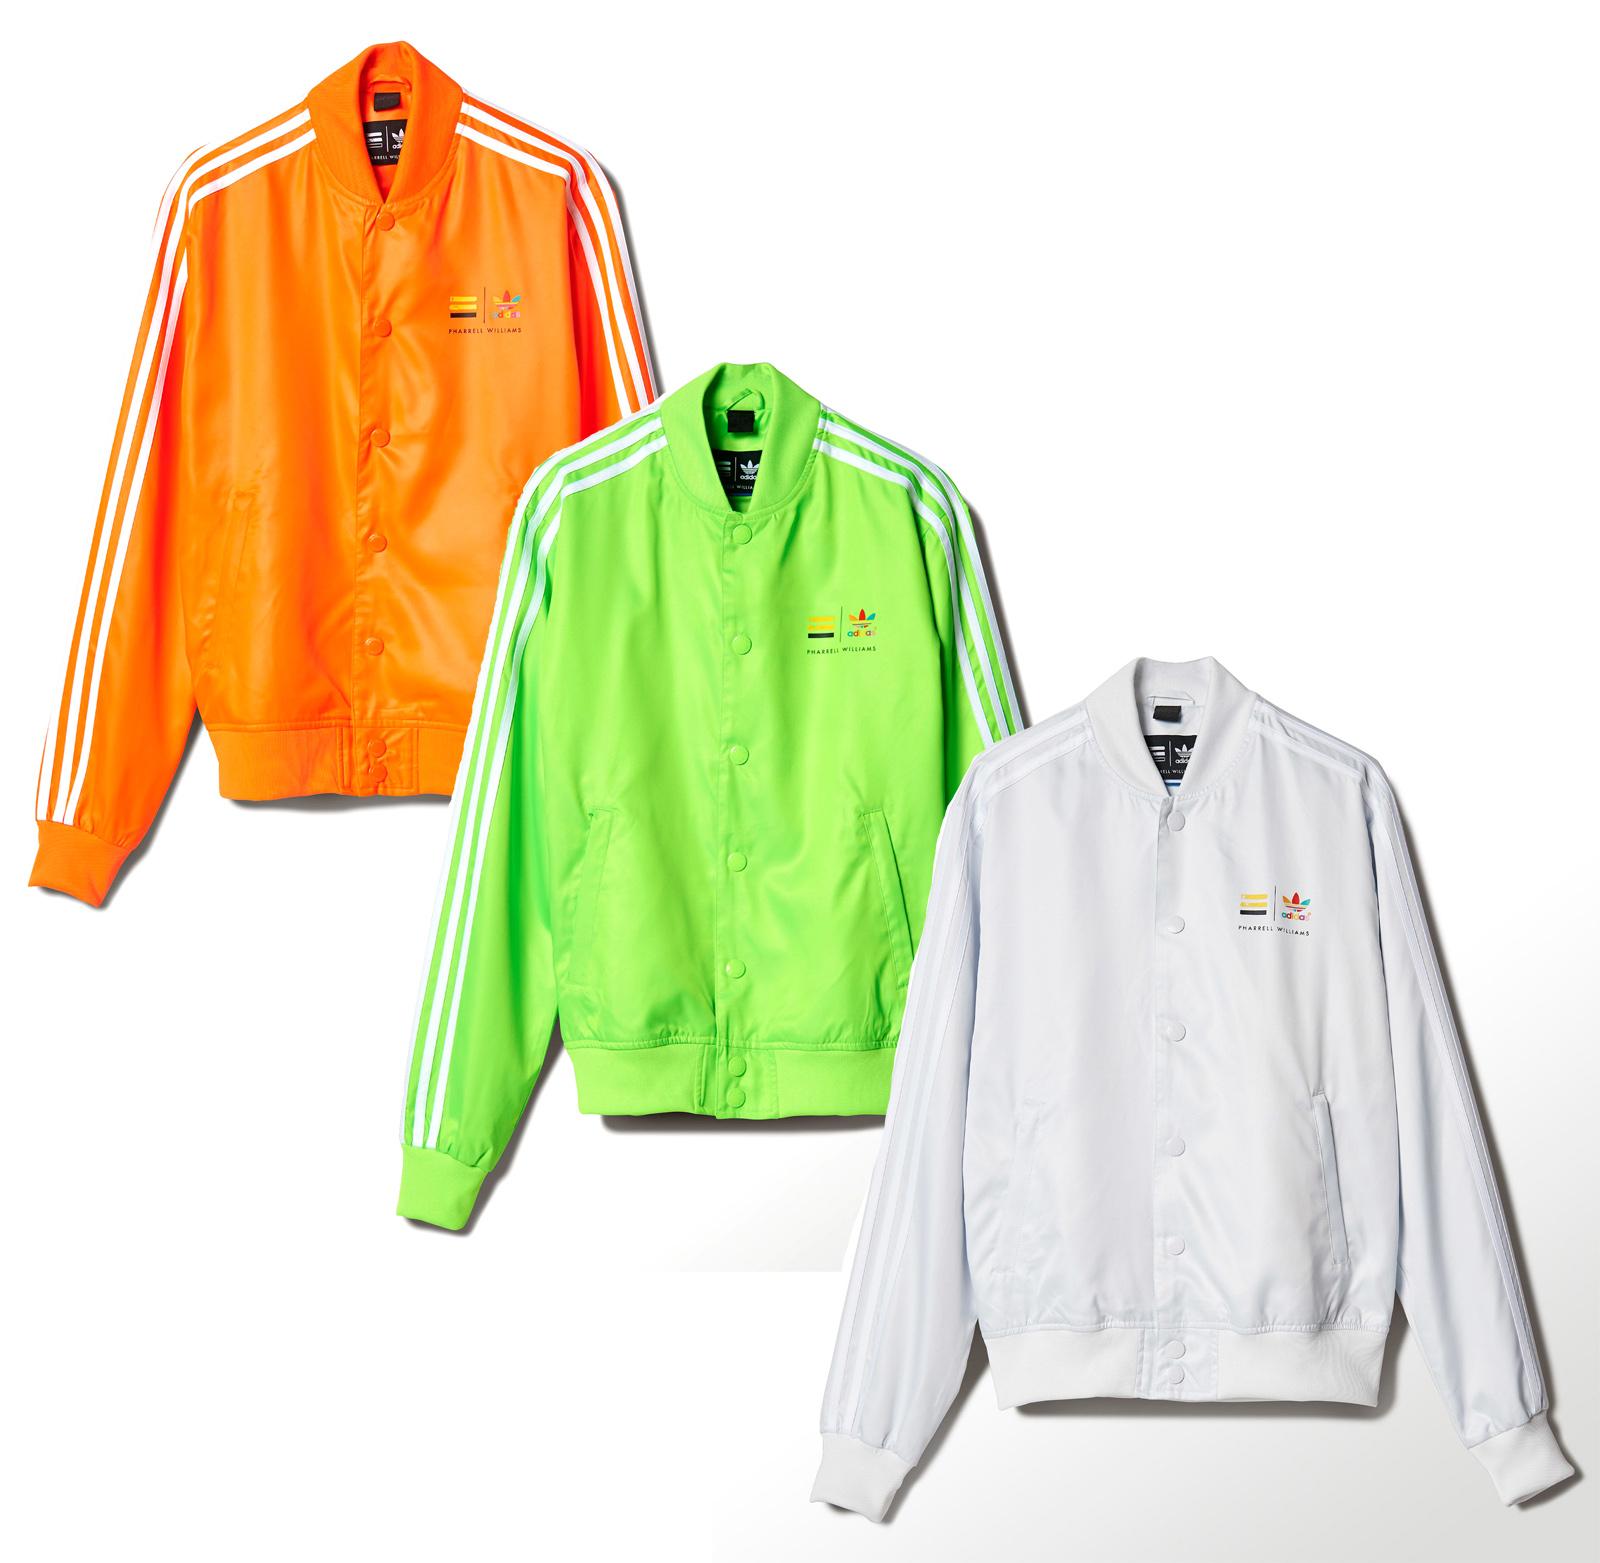 new adidas originals pharrell williams tracksuit tops track jackets bomber coat ebay. Black Bedroom Furniture Sets. Home Design Ideas